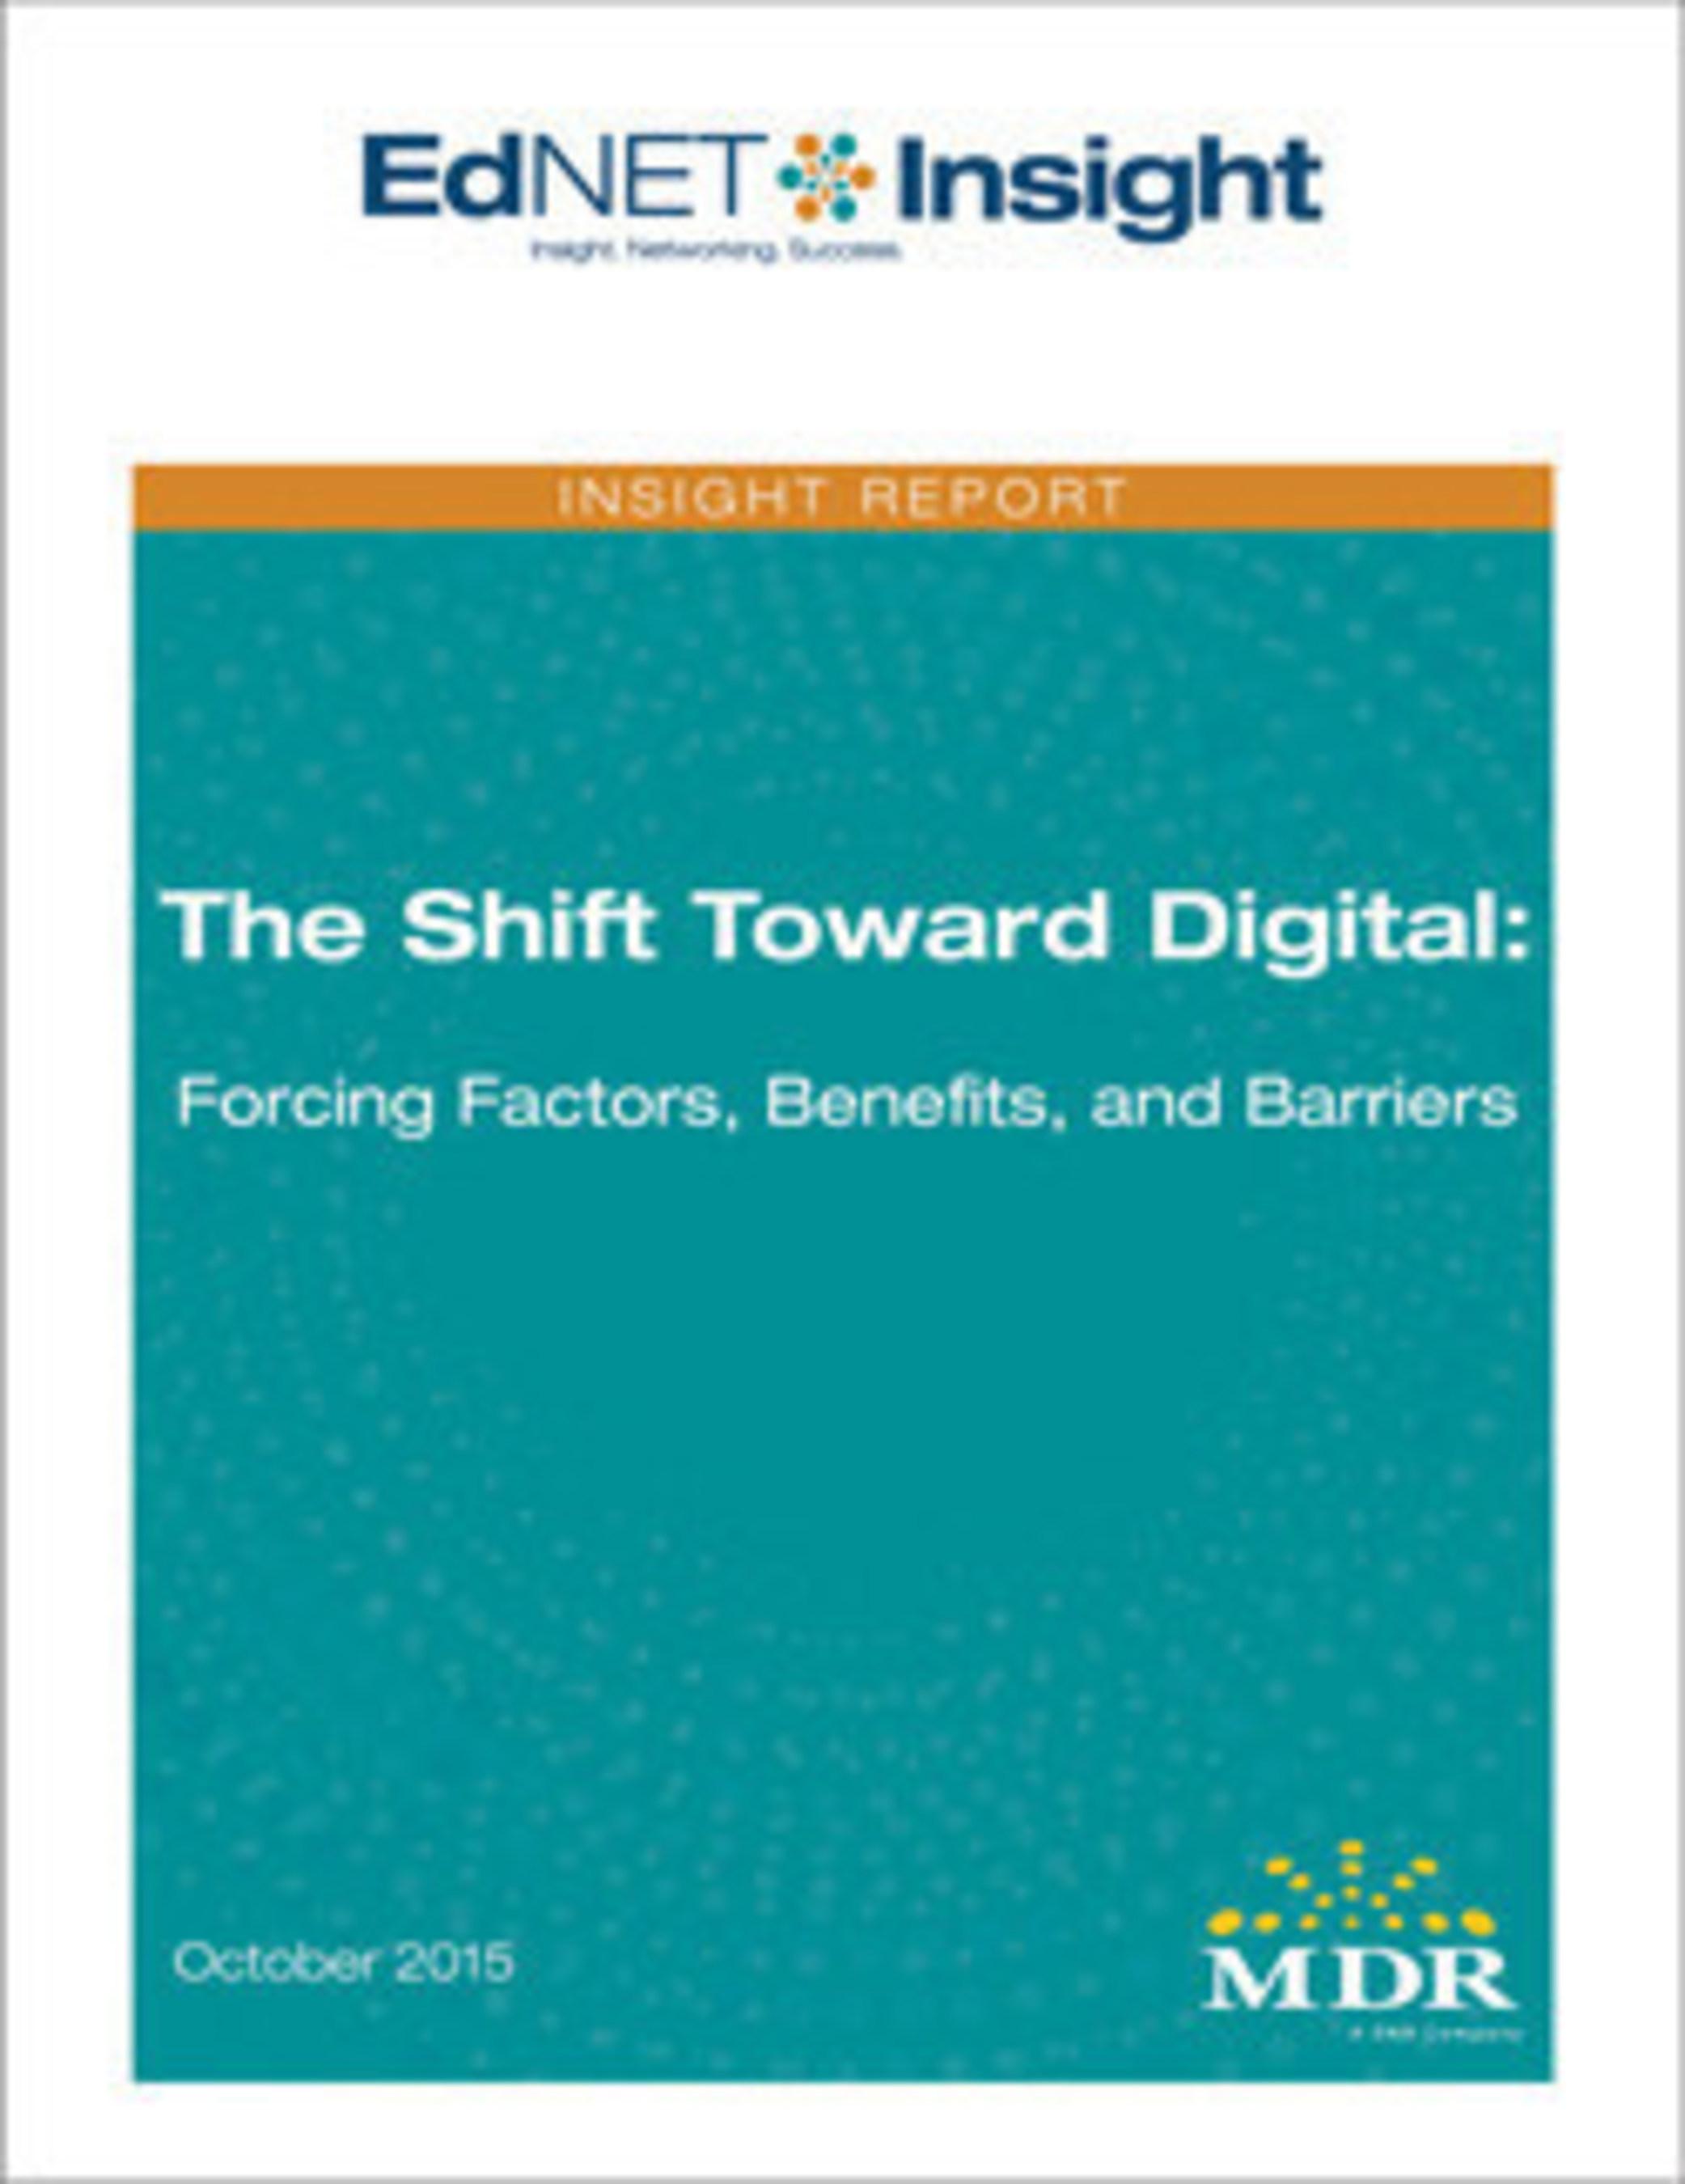 Education's Shift Toward Digital Instructional Materials Is Accelerating